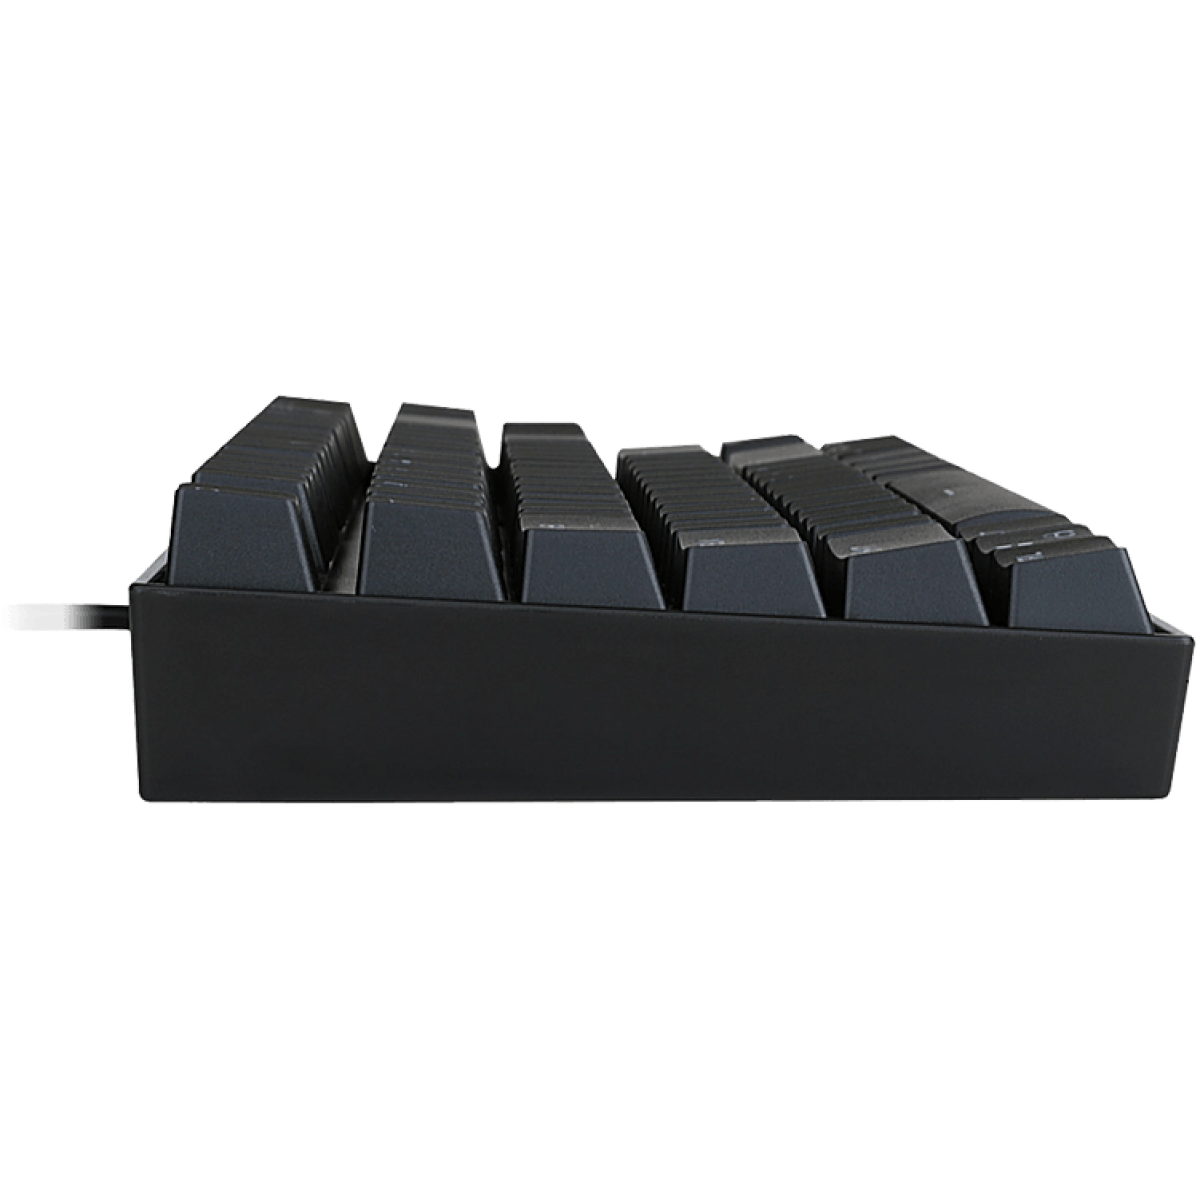 Teclado Mecânico Gamer Redragon Kumara K552 RGB, Switch Red, ABNT2, Black